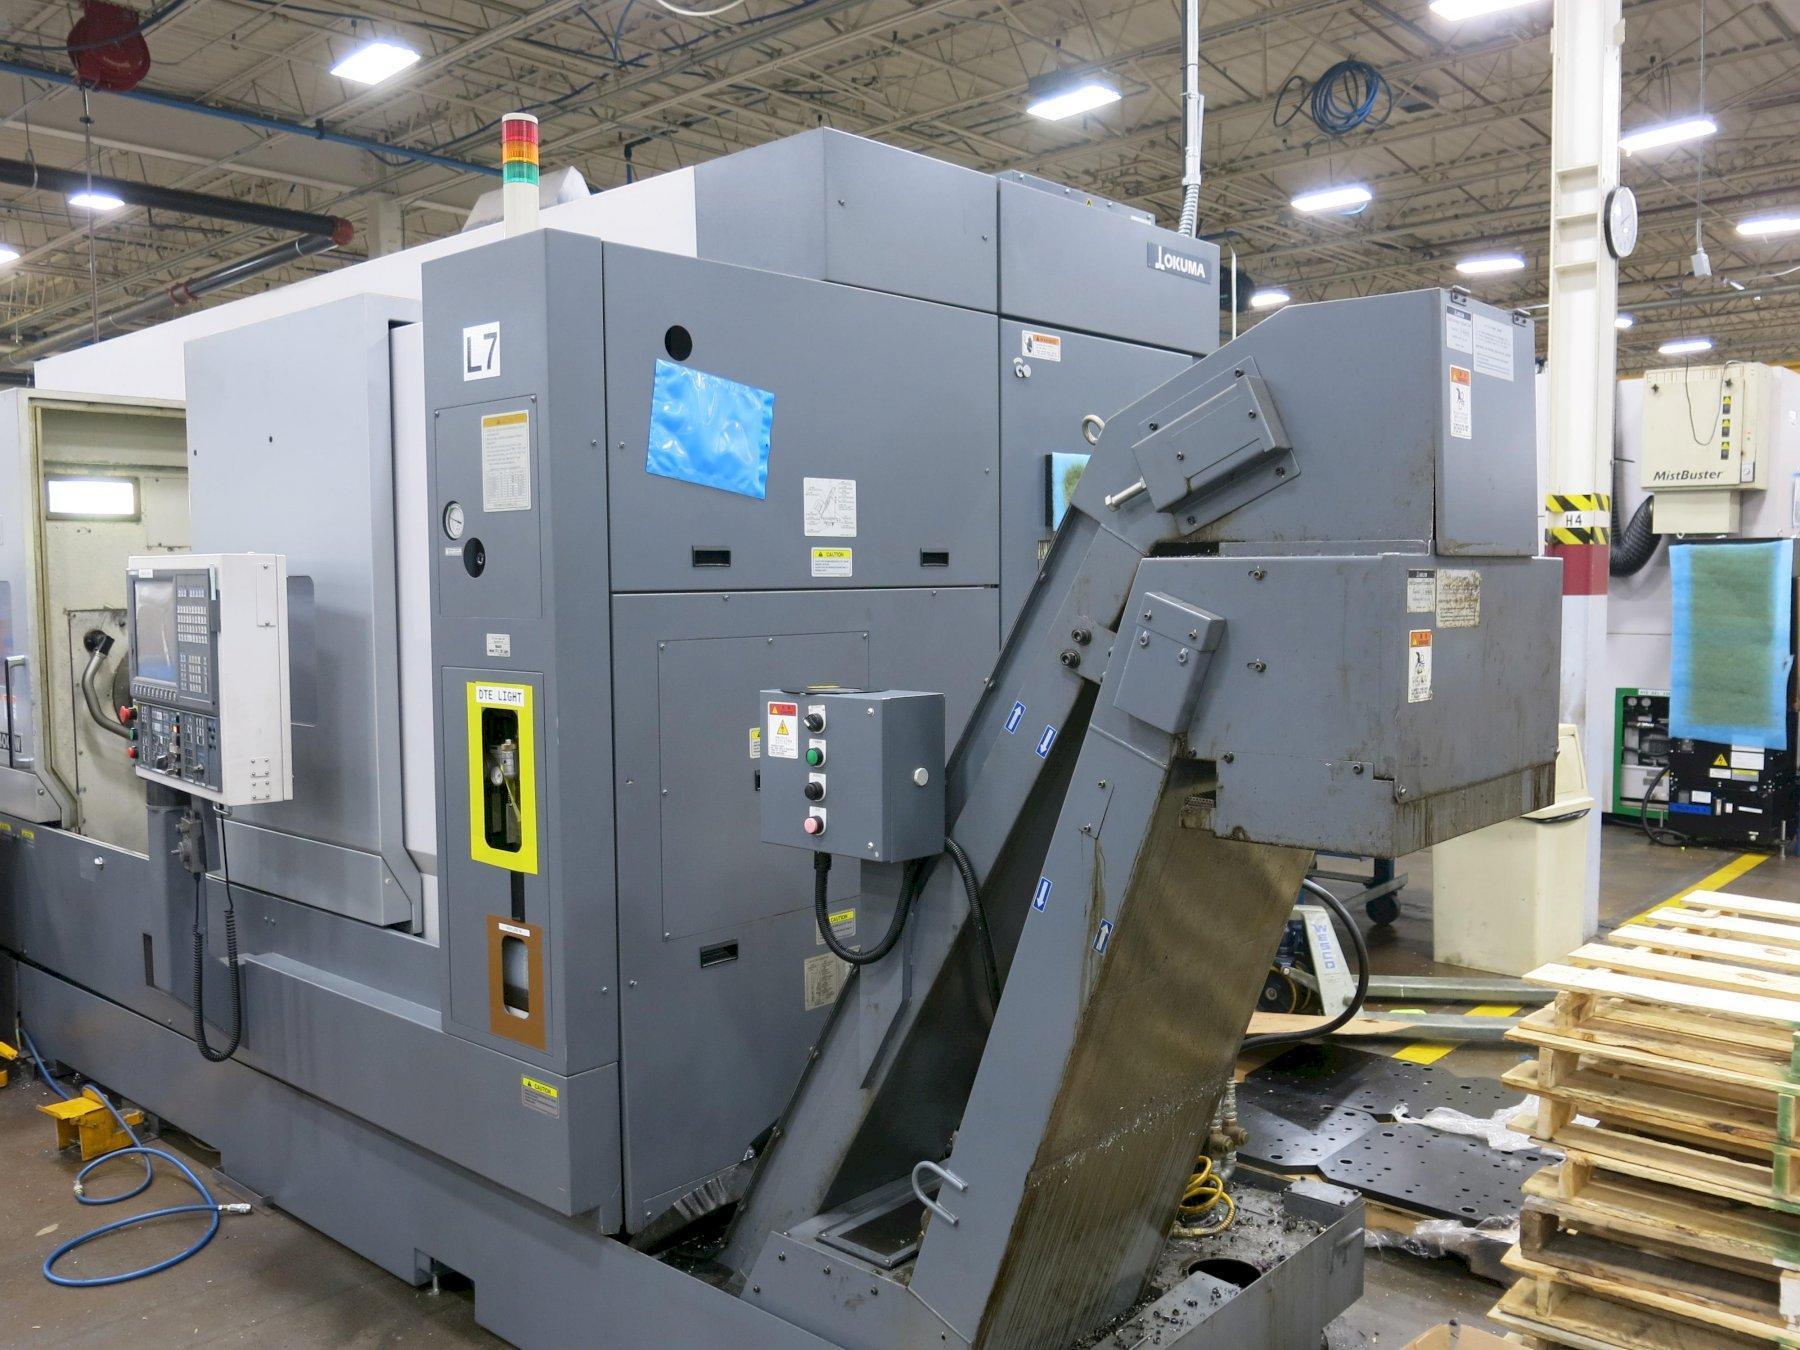 Okuma Multus B-400-W 1500 Mill Turn CNC Lathe, ONLY 2900 cutting hours, New 2011